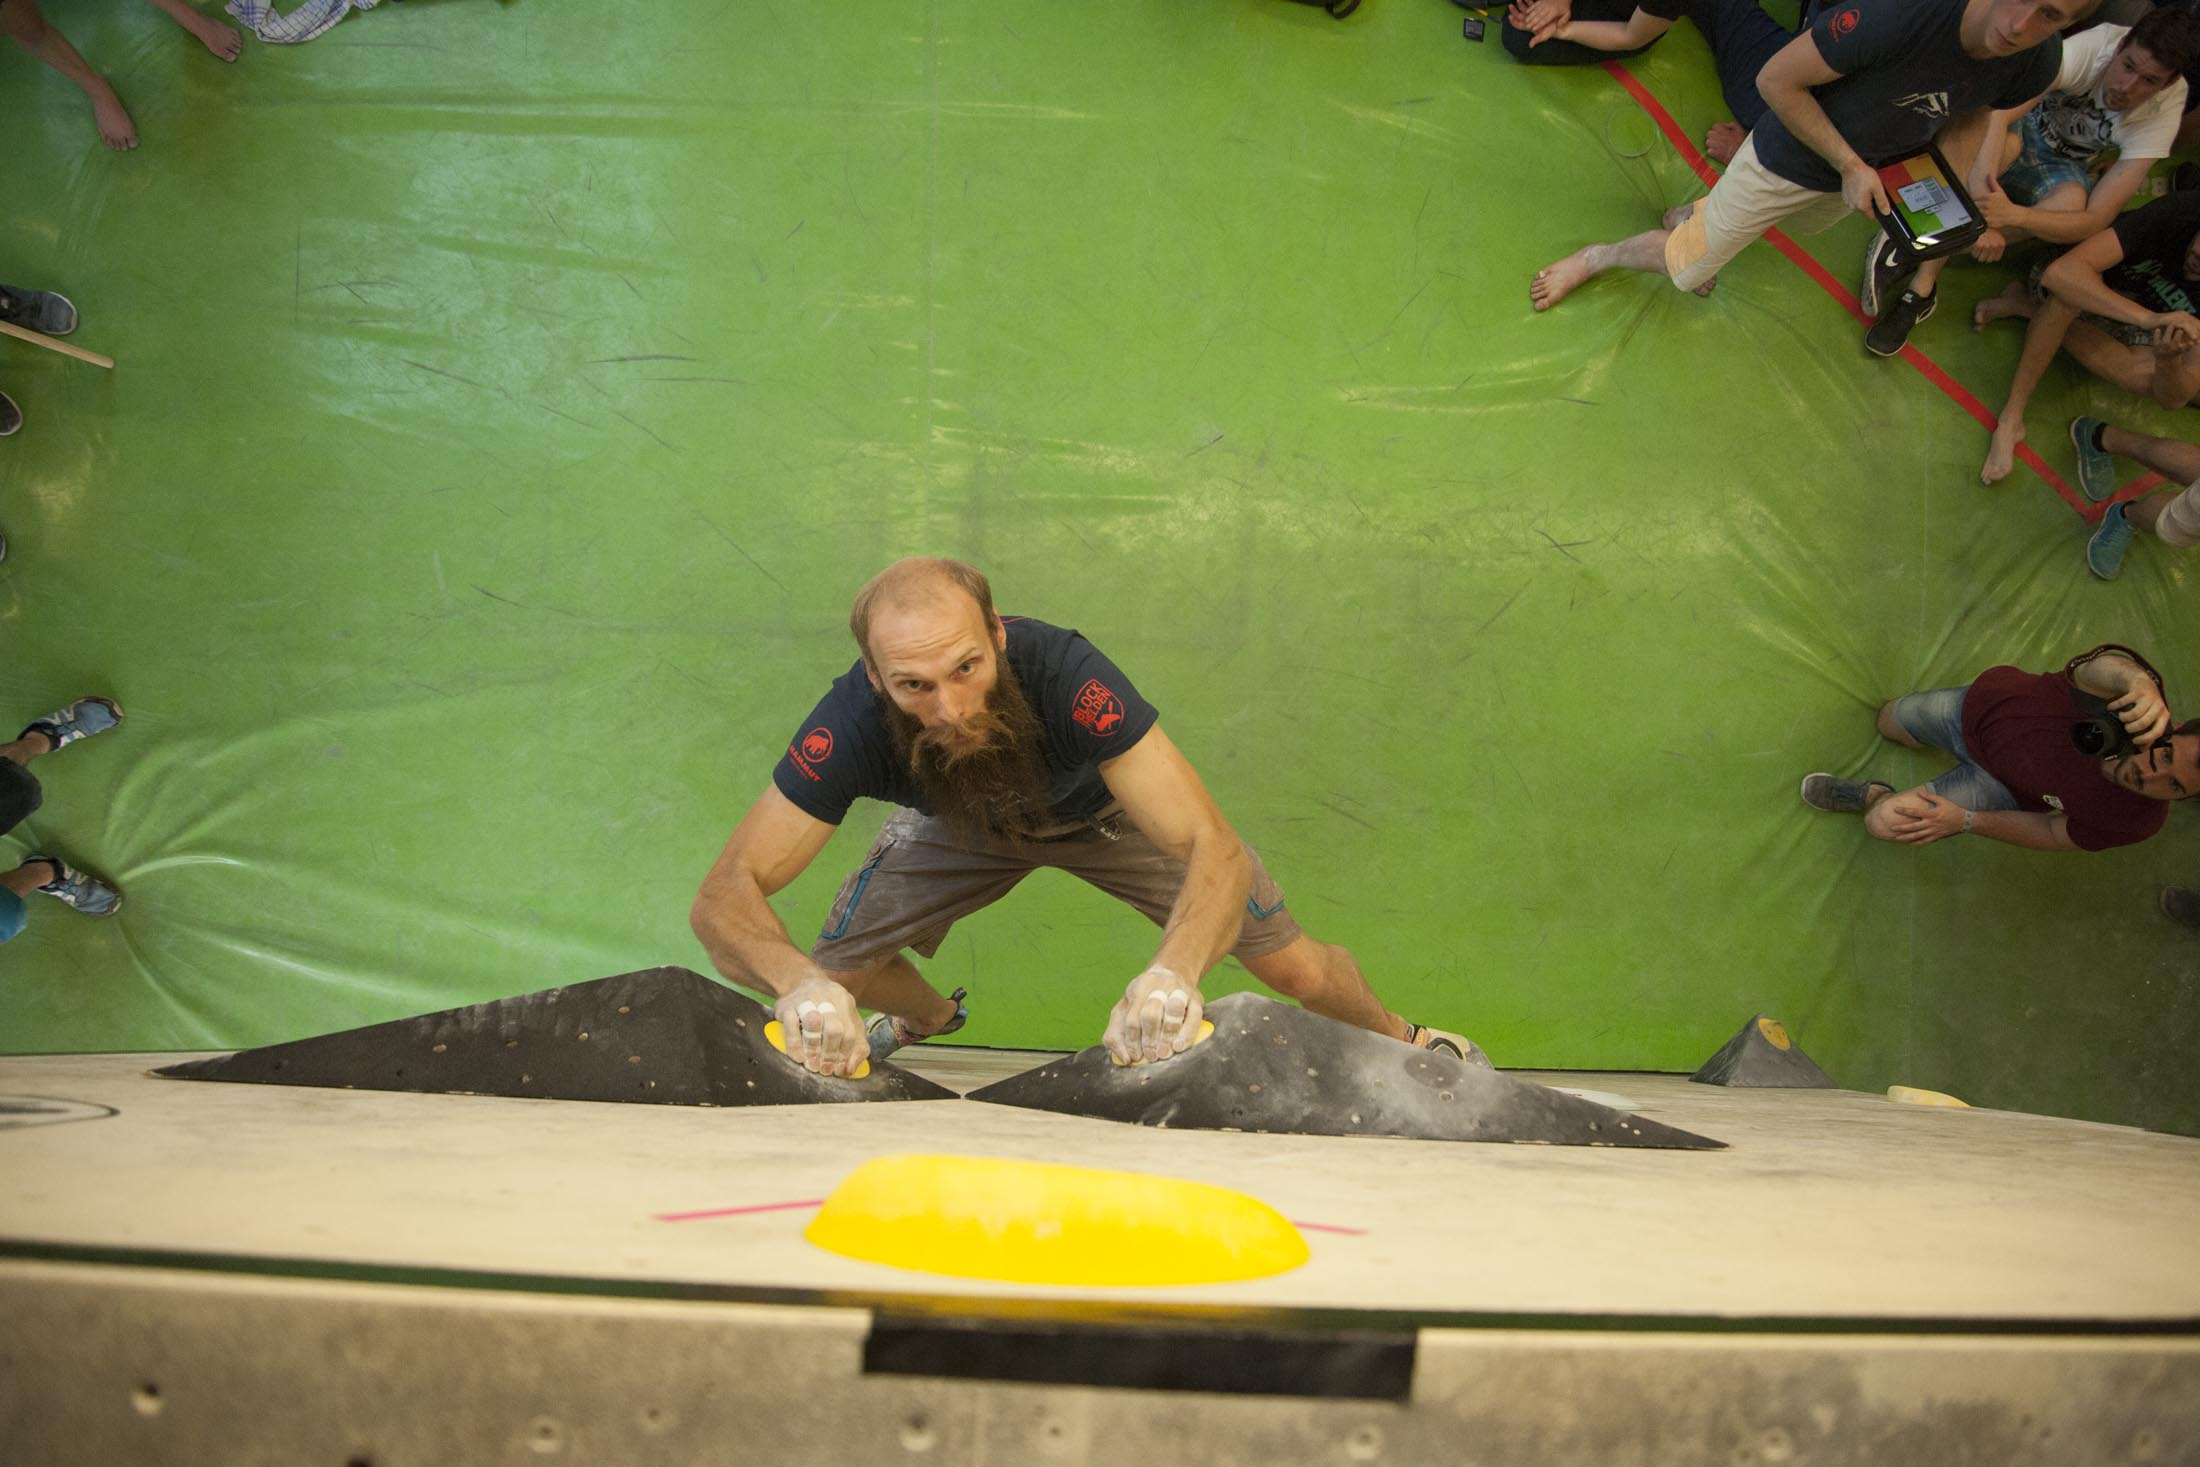 Finale, internationaler bouldercup Frankenjura 2016, BLOCKHELDEN Erlangen, Mammut, Bergfreunde.de, Boulderwettkampf07092016548